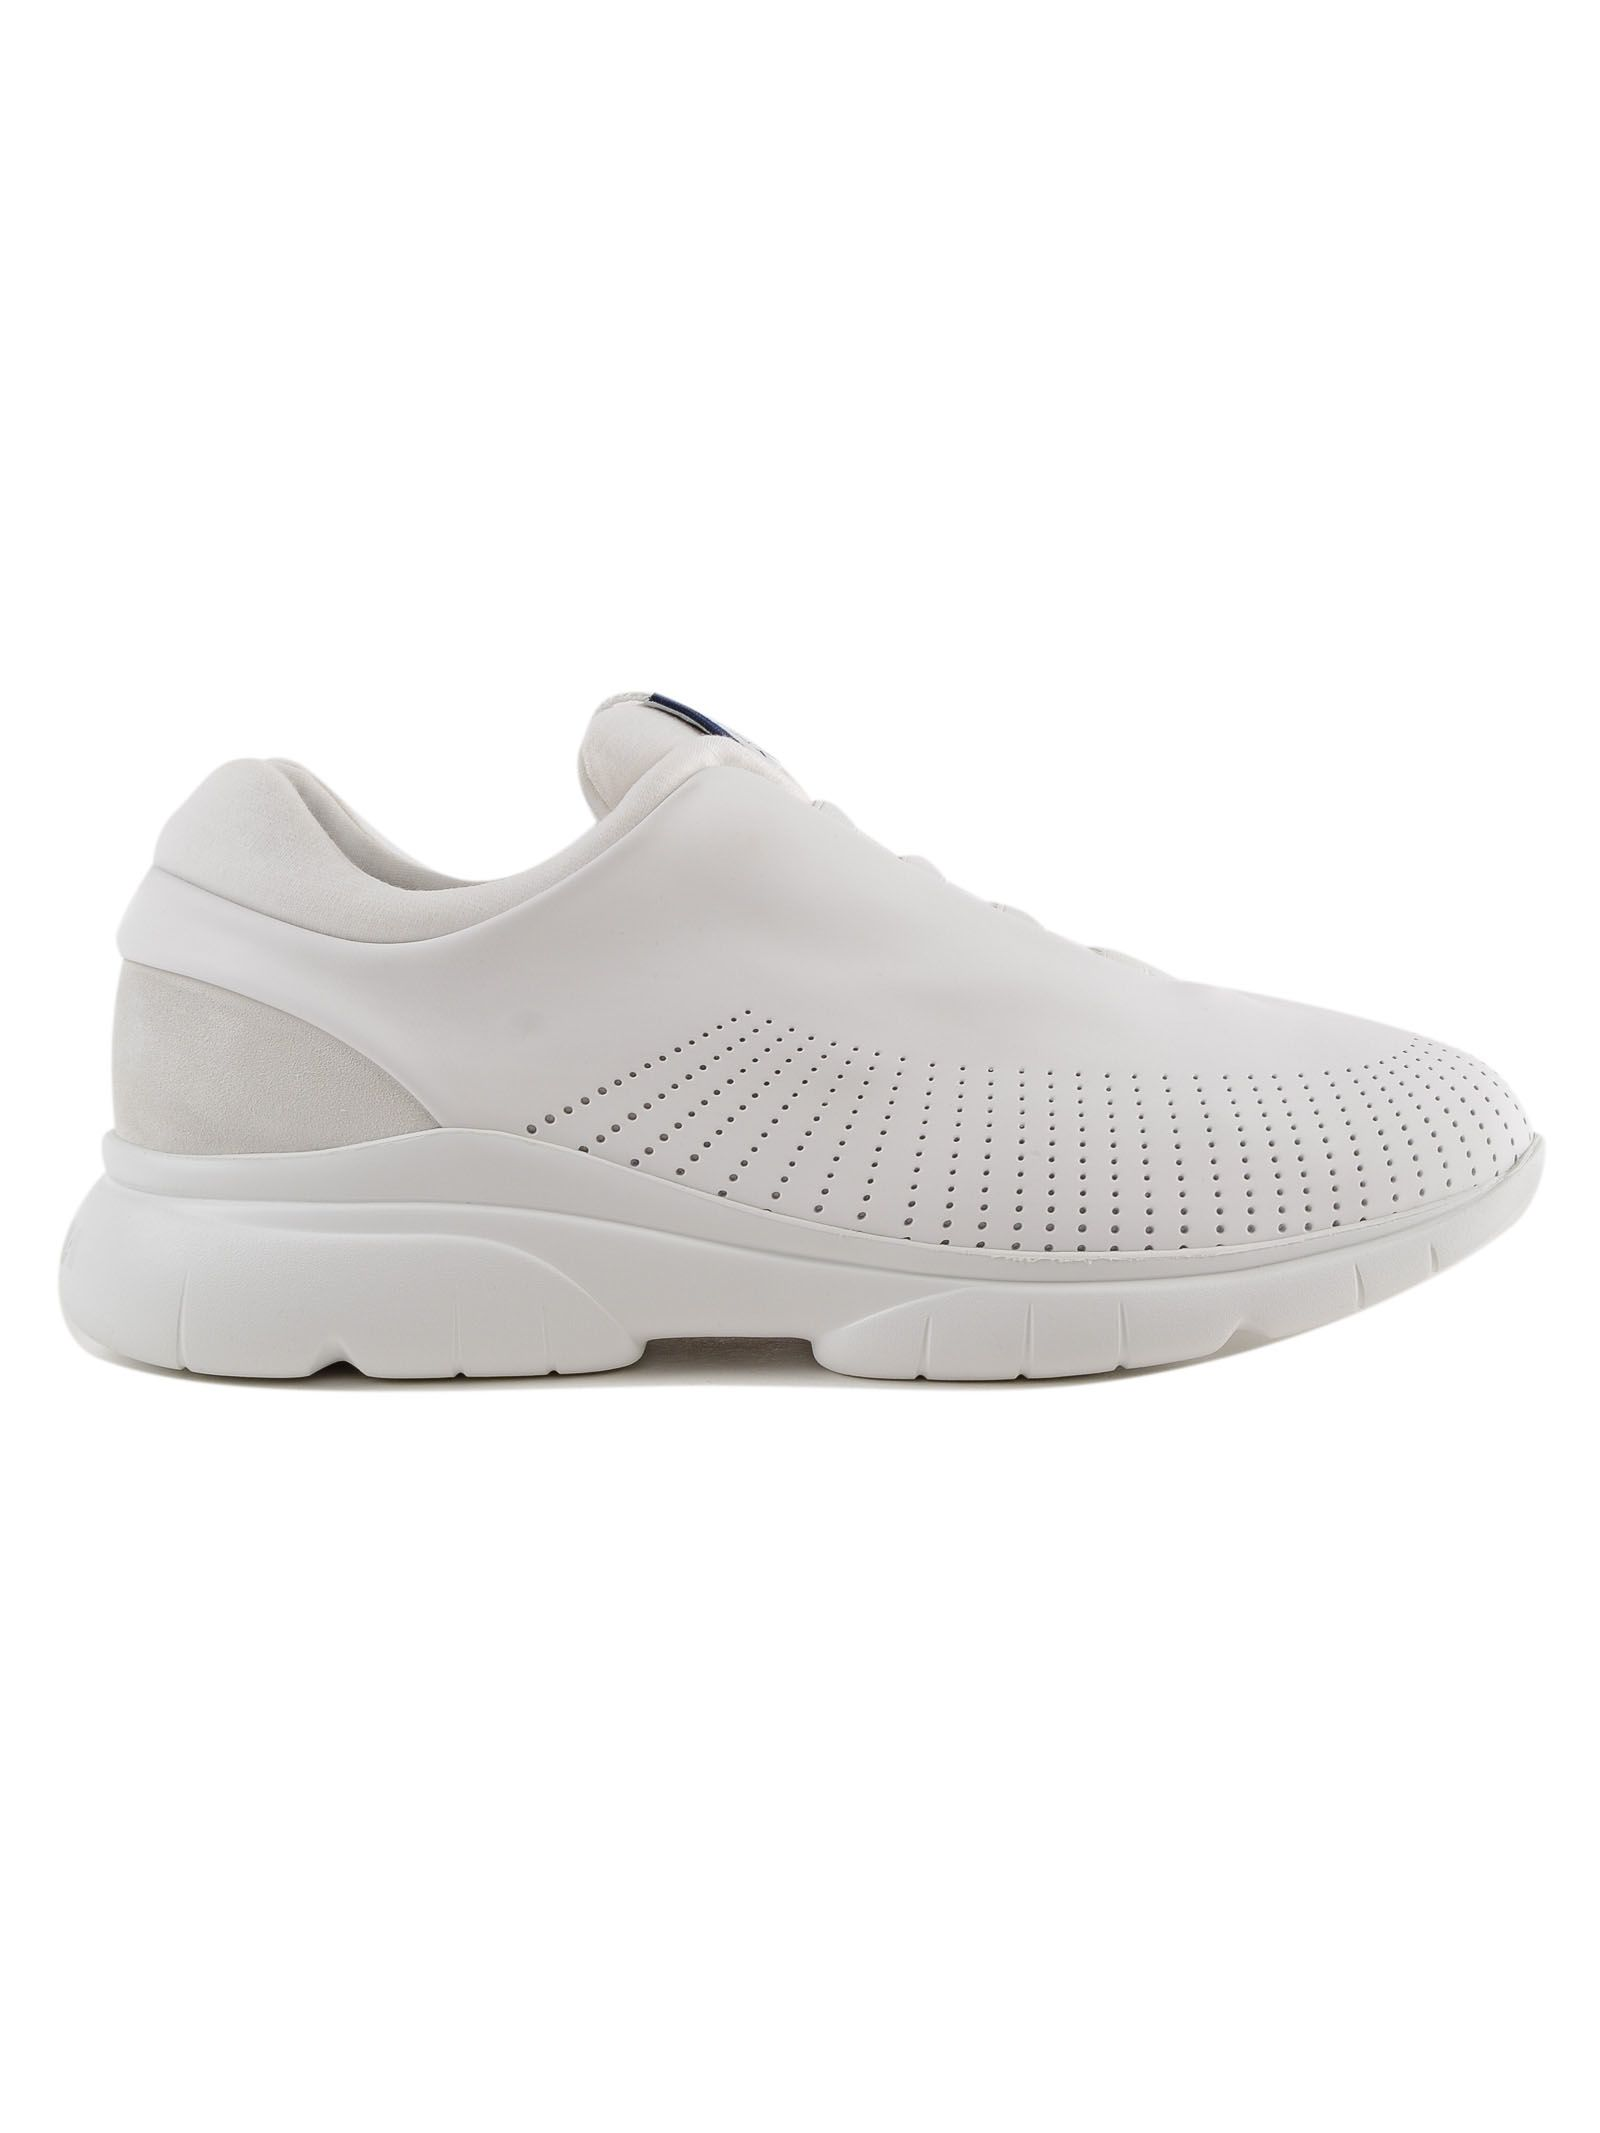 Ermenegildo Zegna Perforated Sneakers